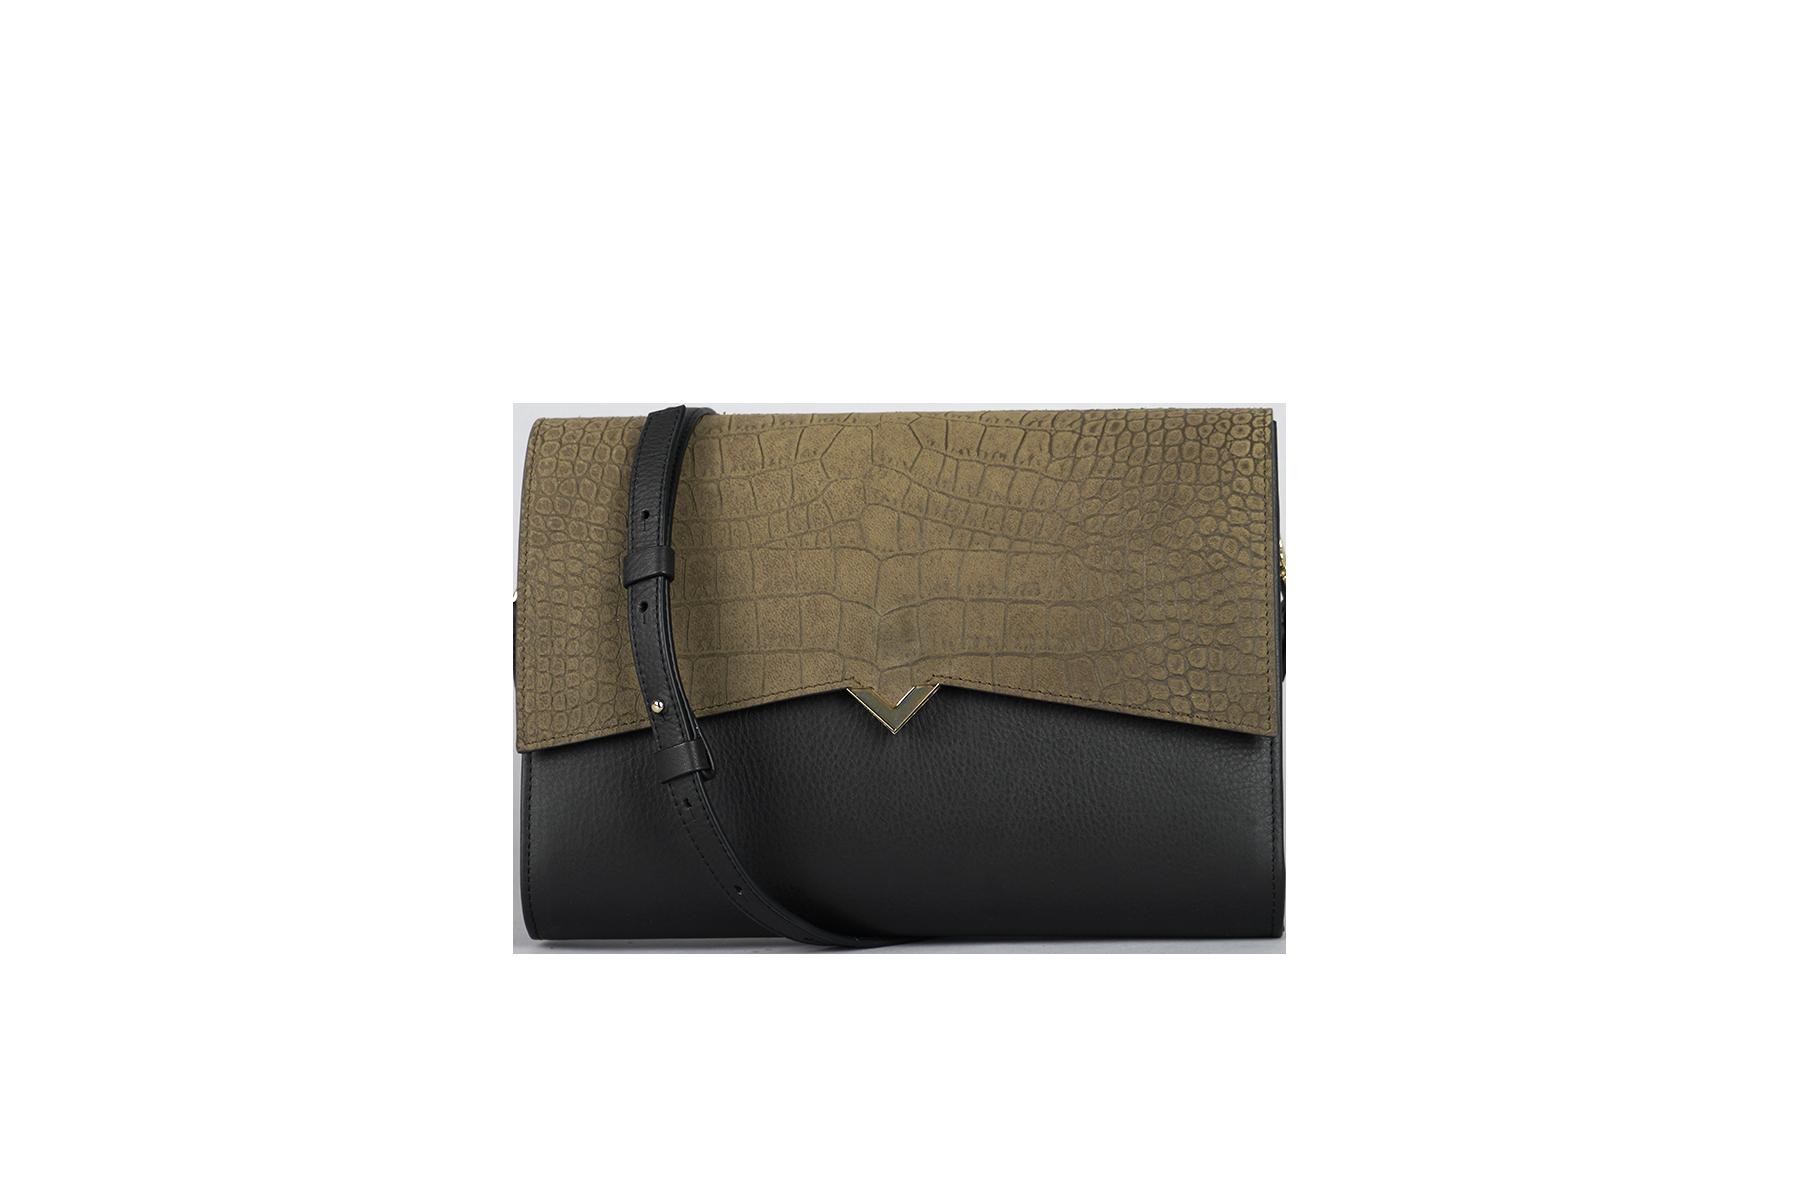 Roma Bag - Black Caviar Leather & Kaki Croco Cover